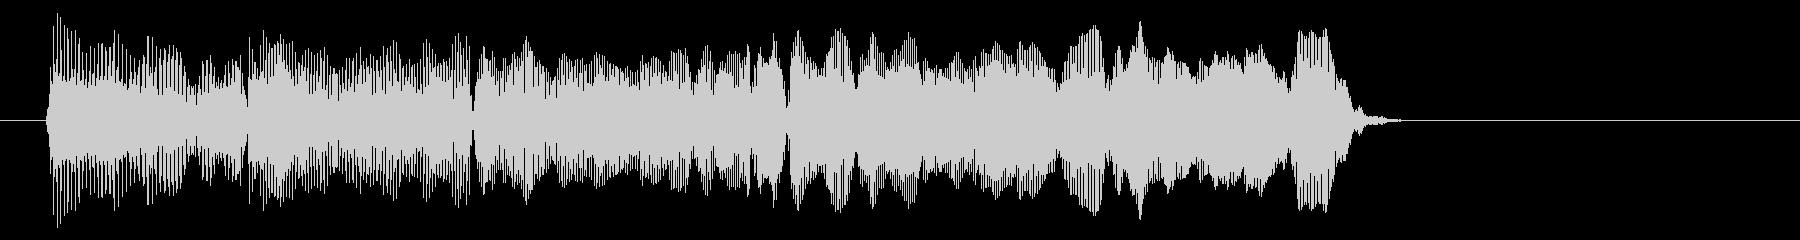 8bitパワーup-01-3_dryの未再生の波形